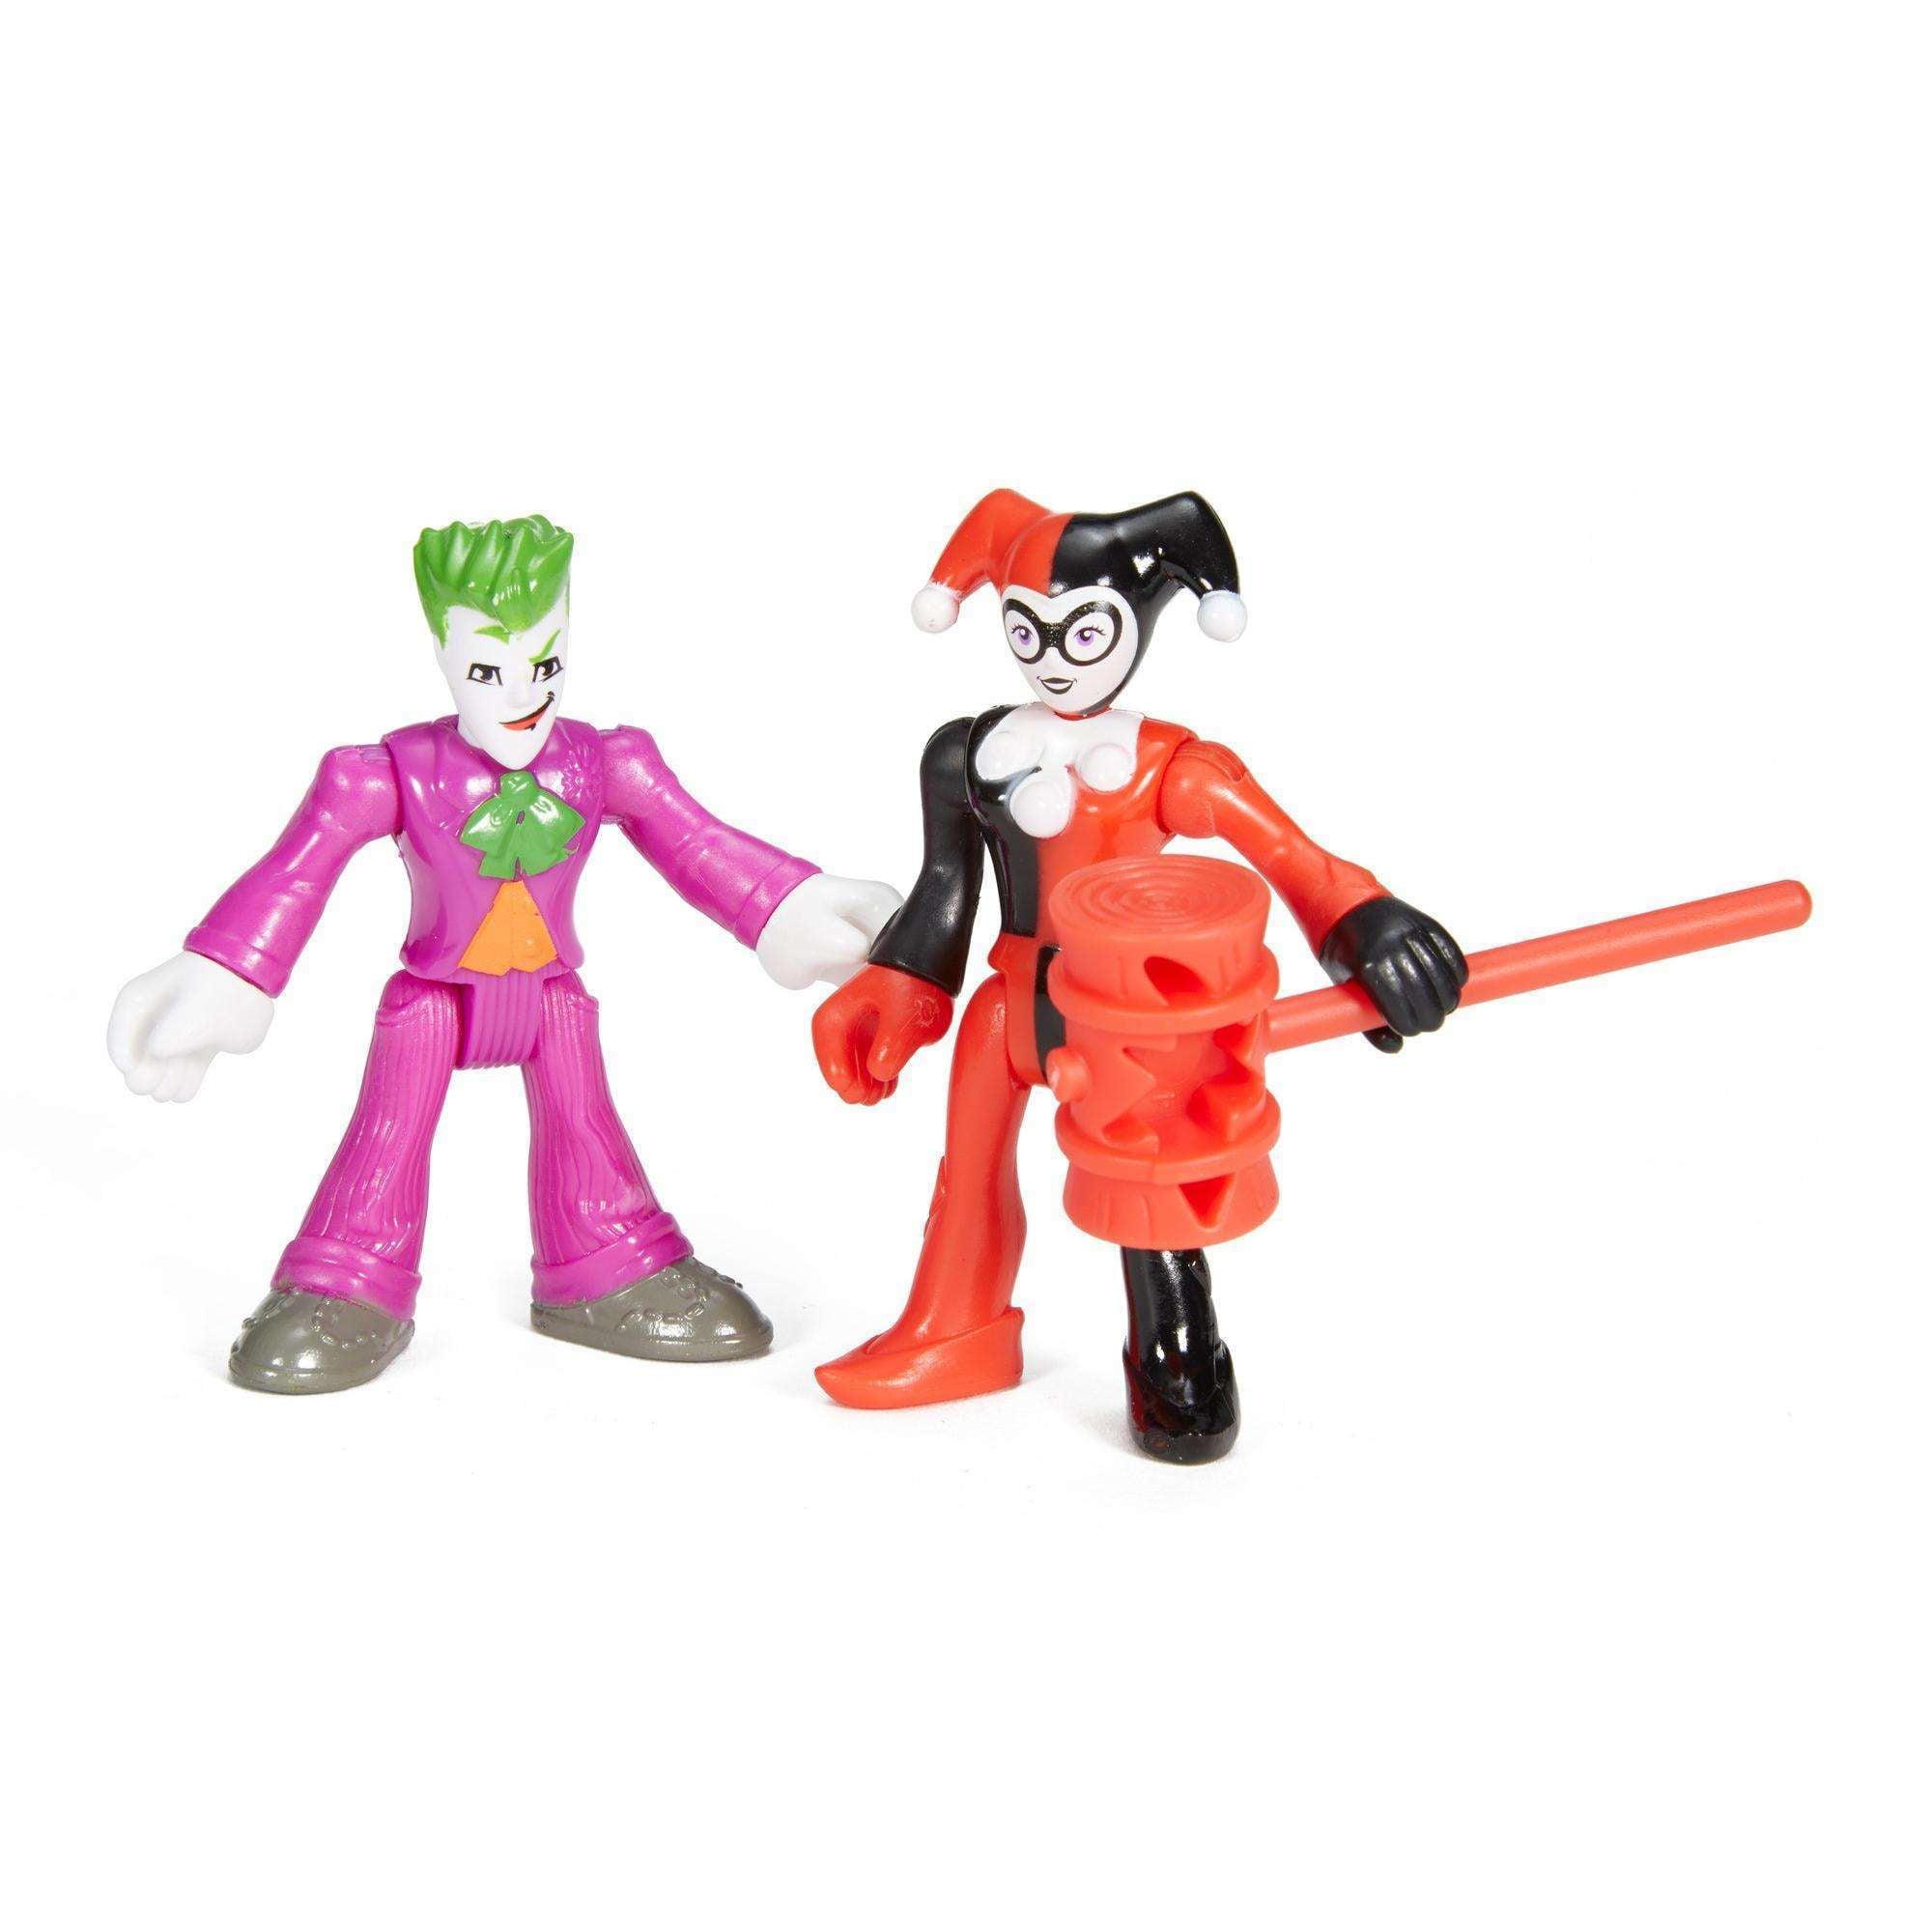 The Joker Super Friends Retro Action Figures Series